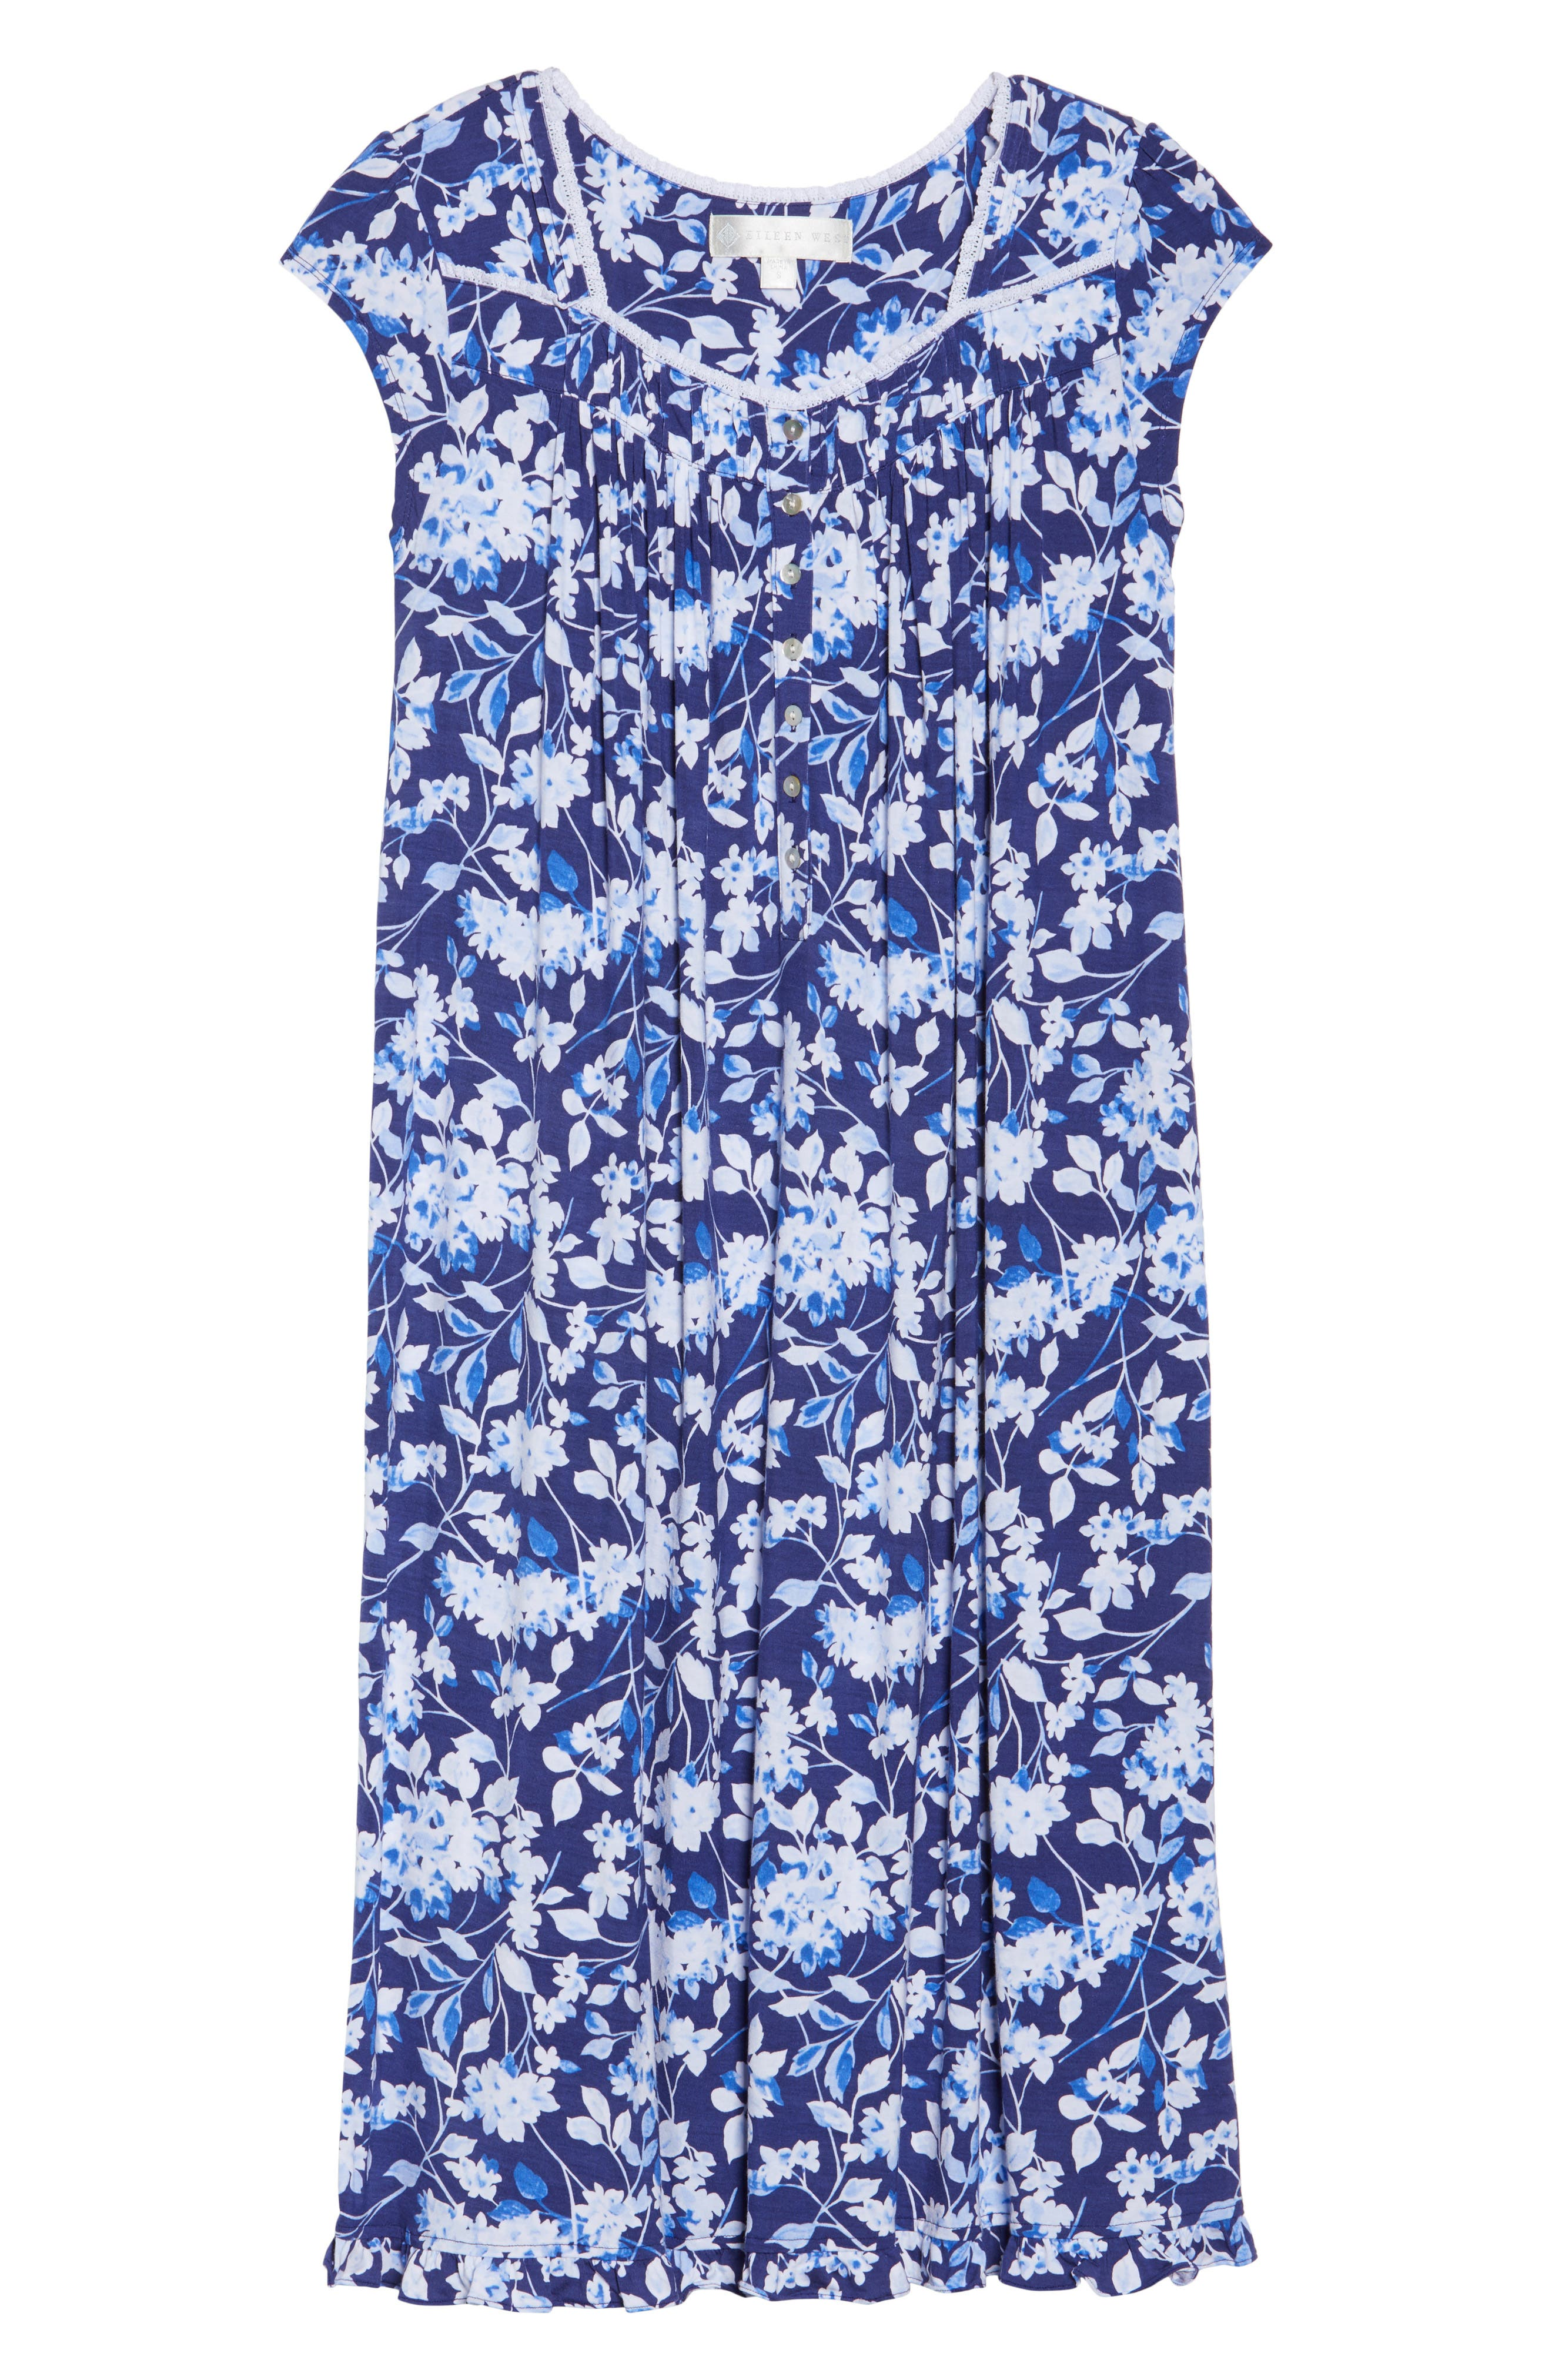 Waltz Nightgown,                             Alternate thumbnail 4, color,                             Blue Multi Floral